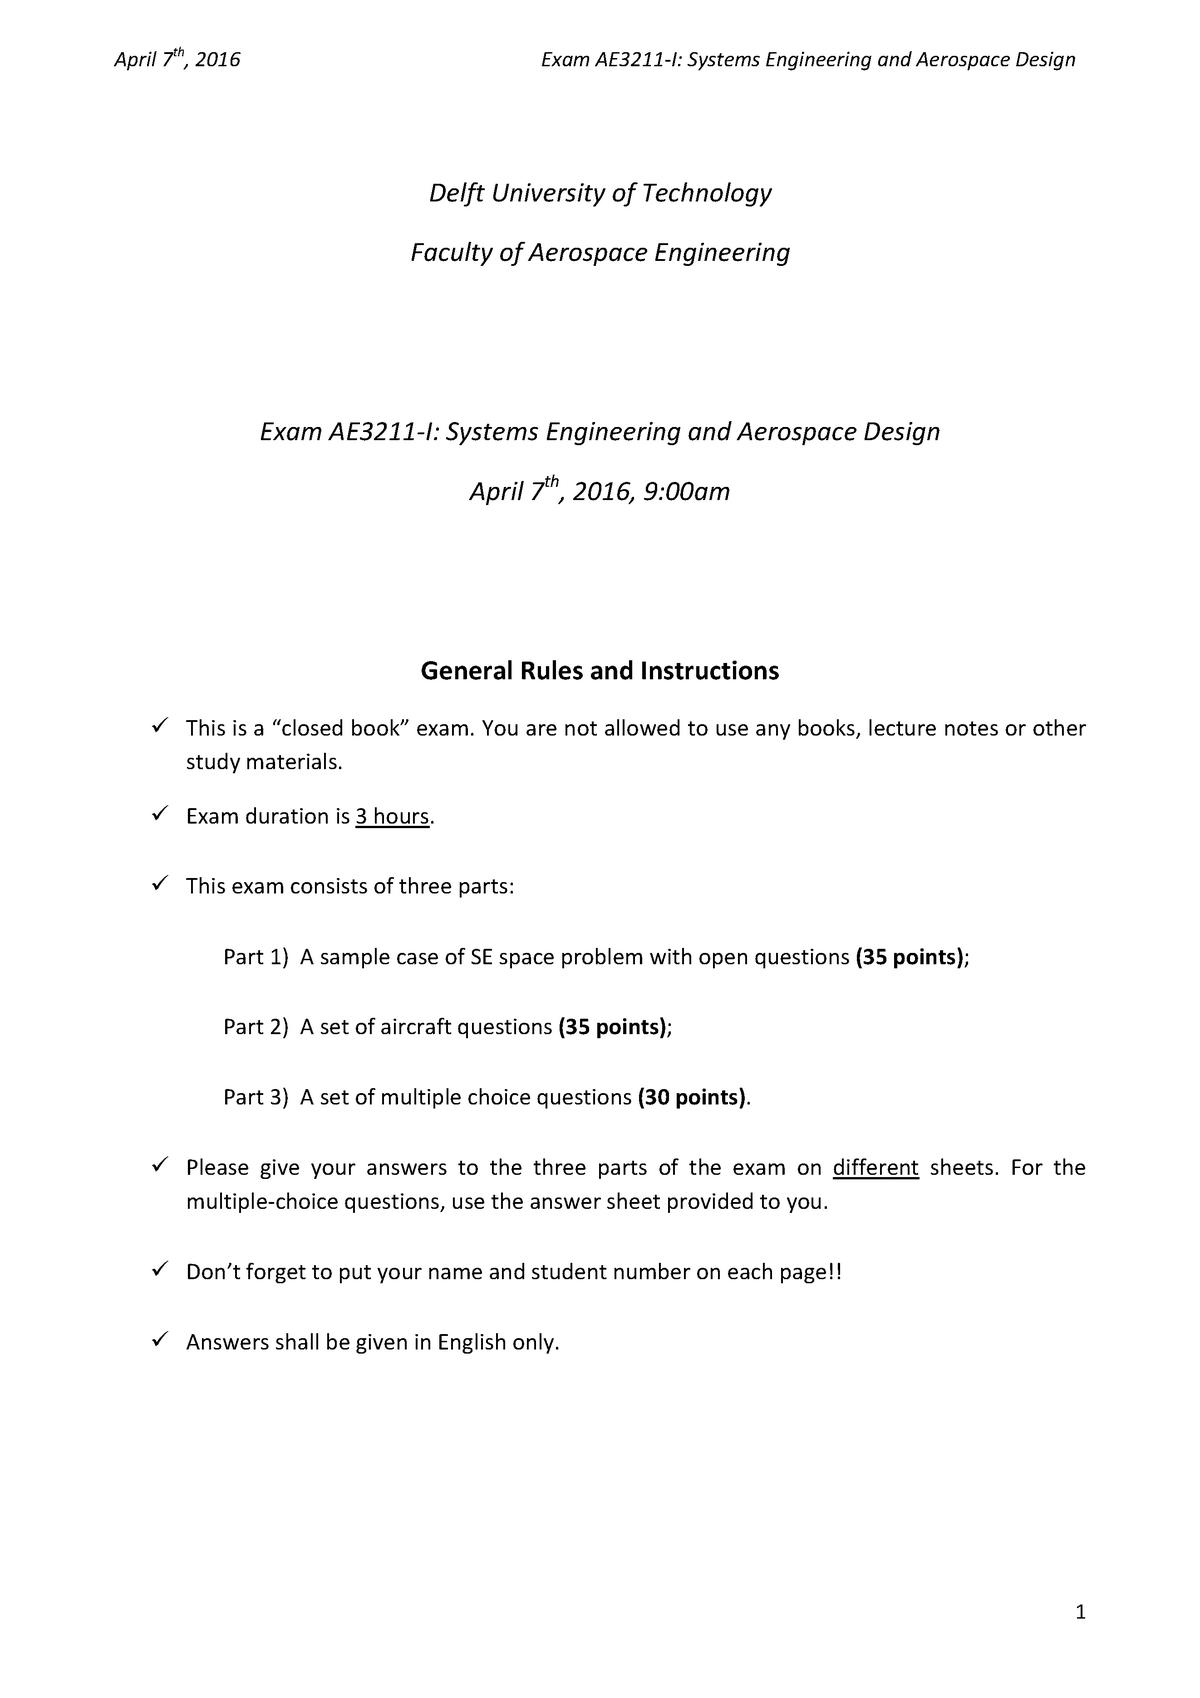 Tentamen 2016 - AE3211-I: Systems Engineering & Aerospace Design